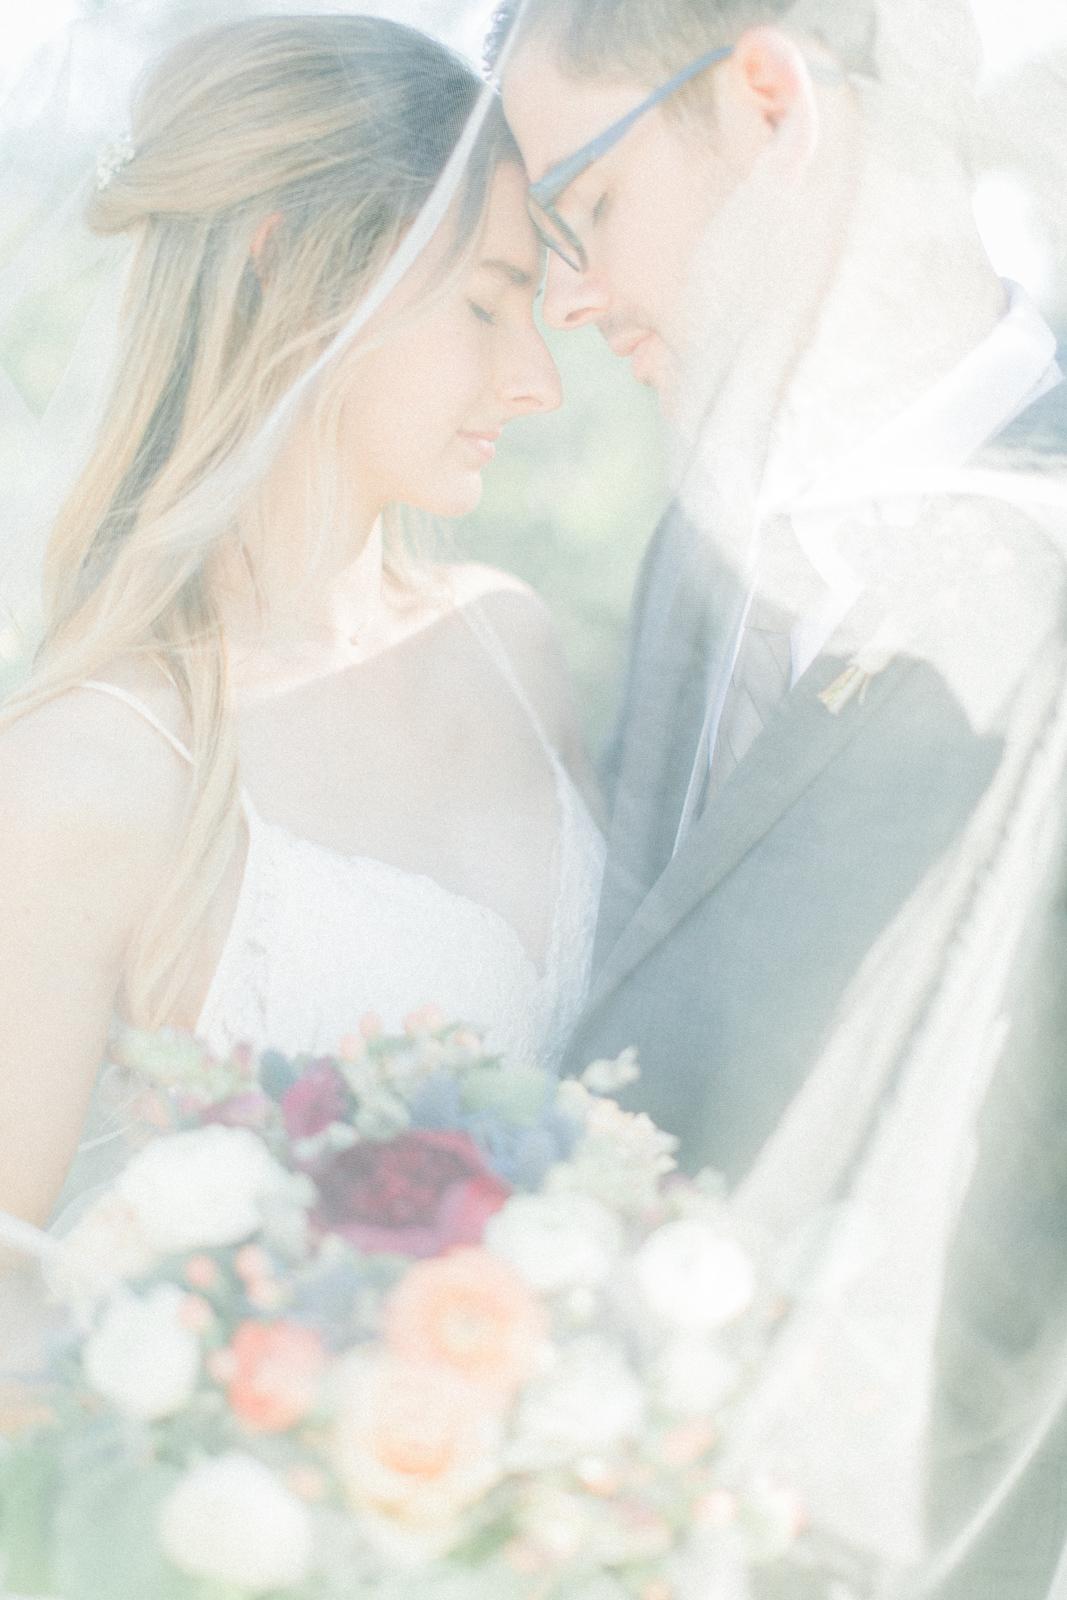 boise-idaho-elopement-engagement-photographer-9281.jpg